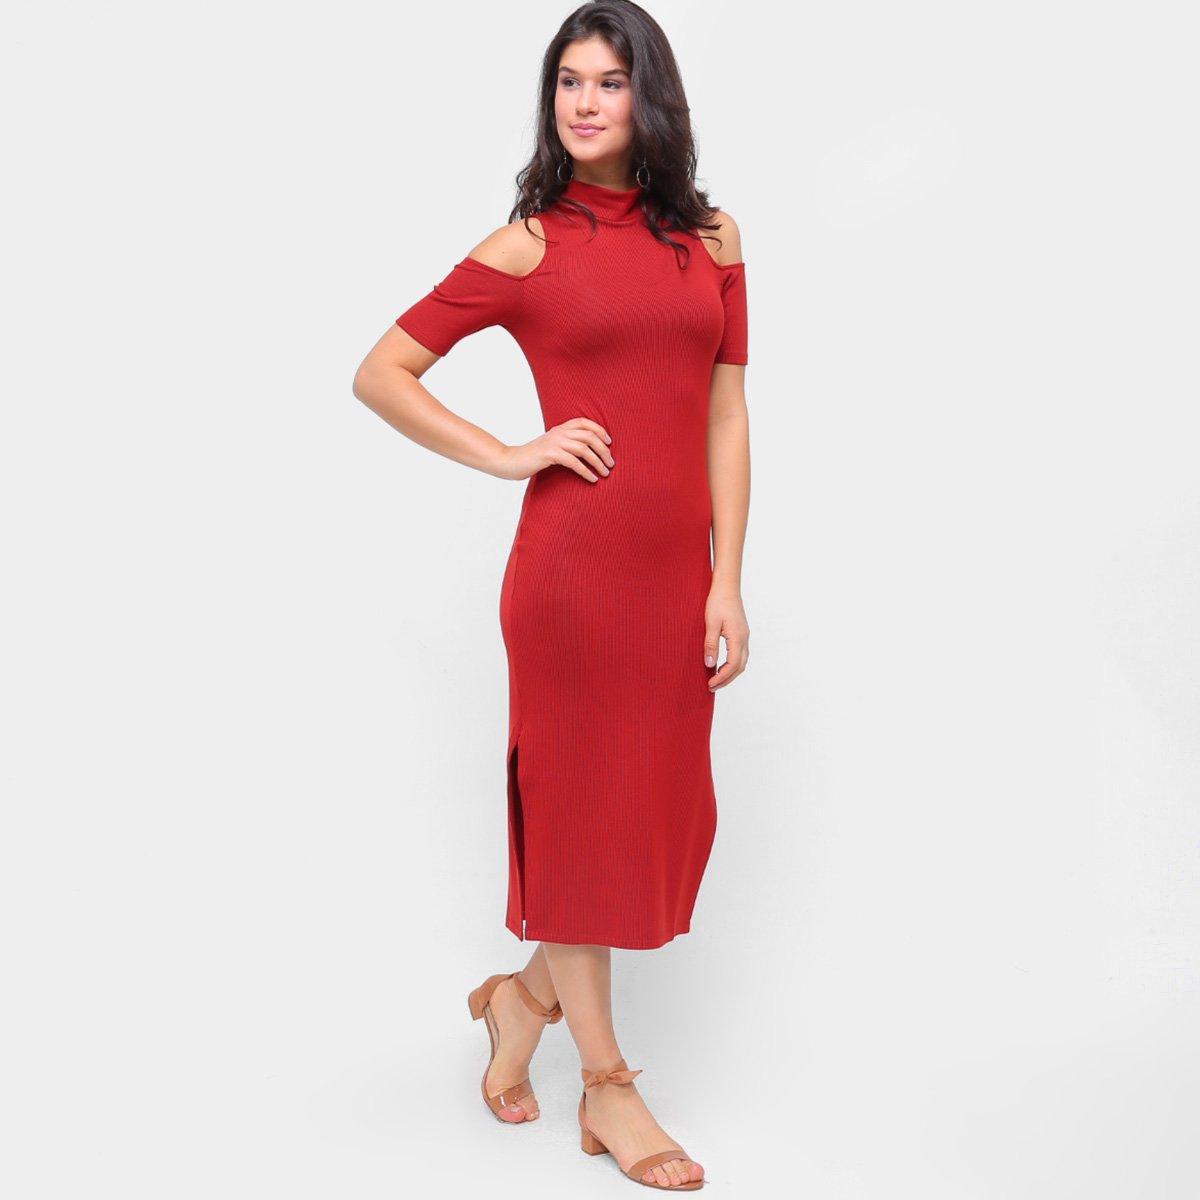 Vestido Morena Rosa Midi Gola Alta Abertura Ombro Listrado